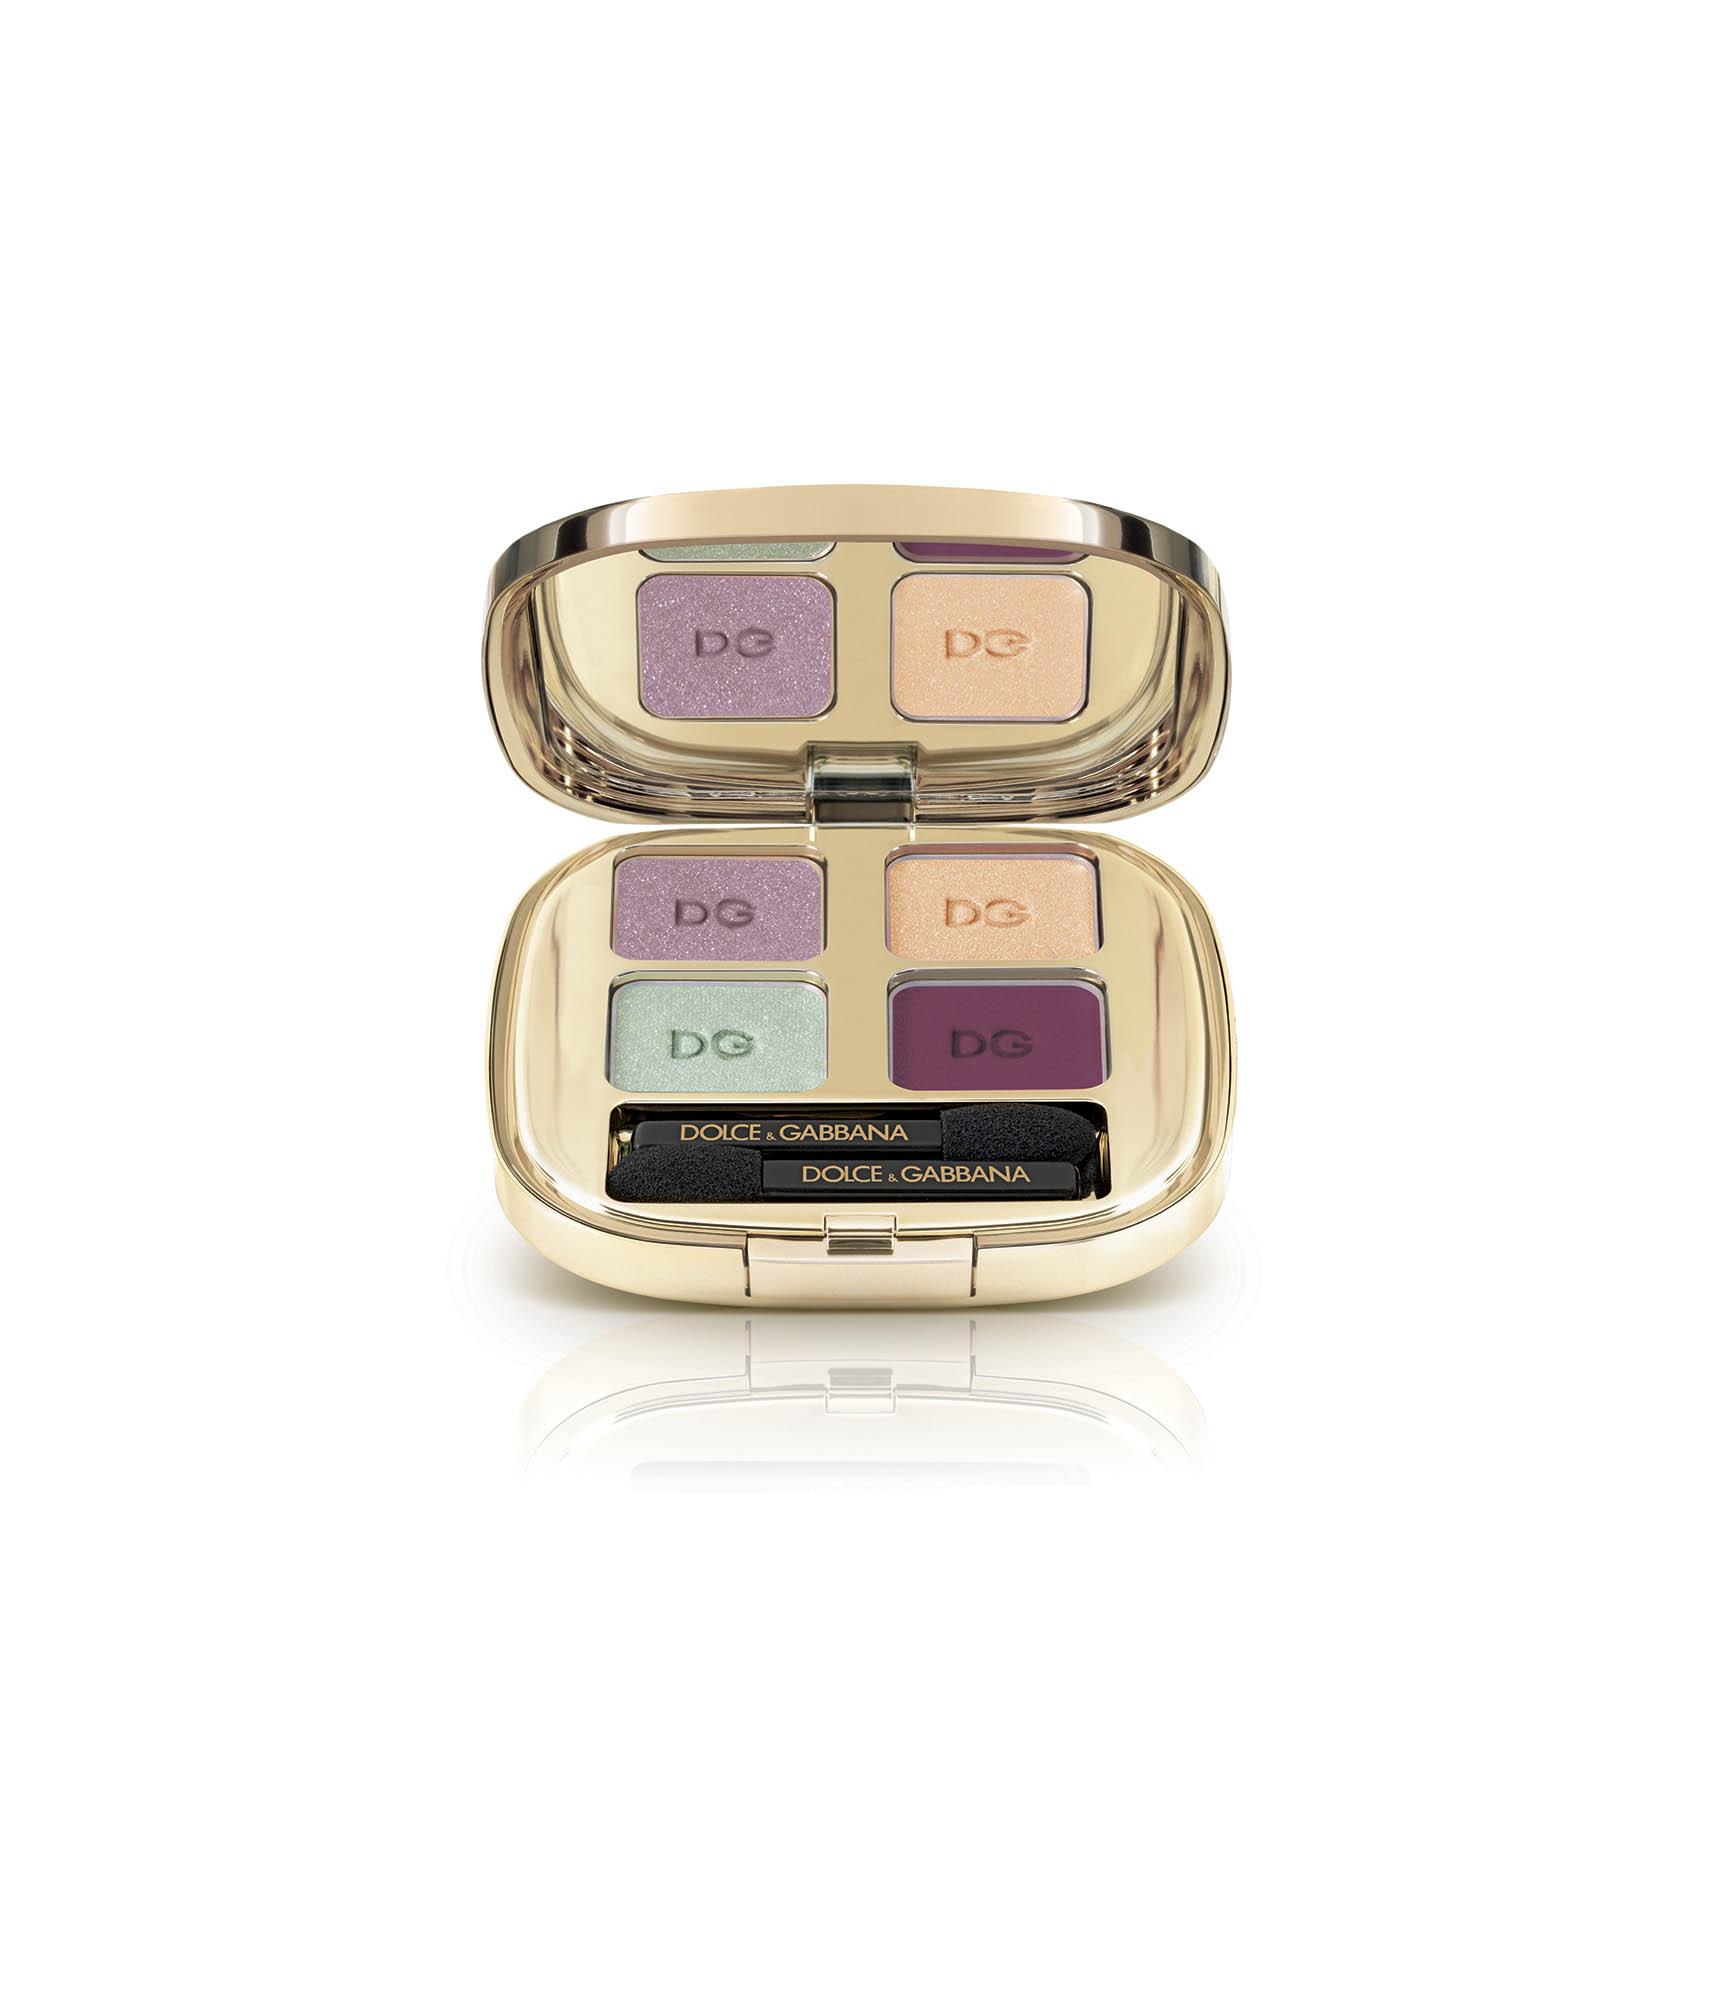 Dolce & Gabbana make up autunno 2017, foto e prezzi